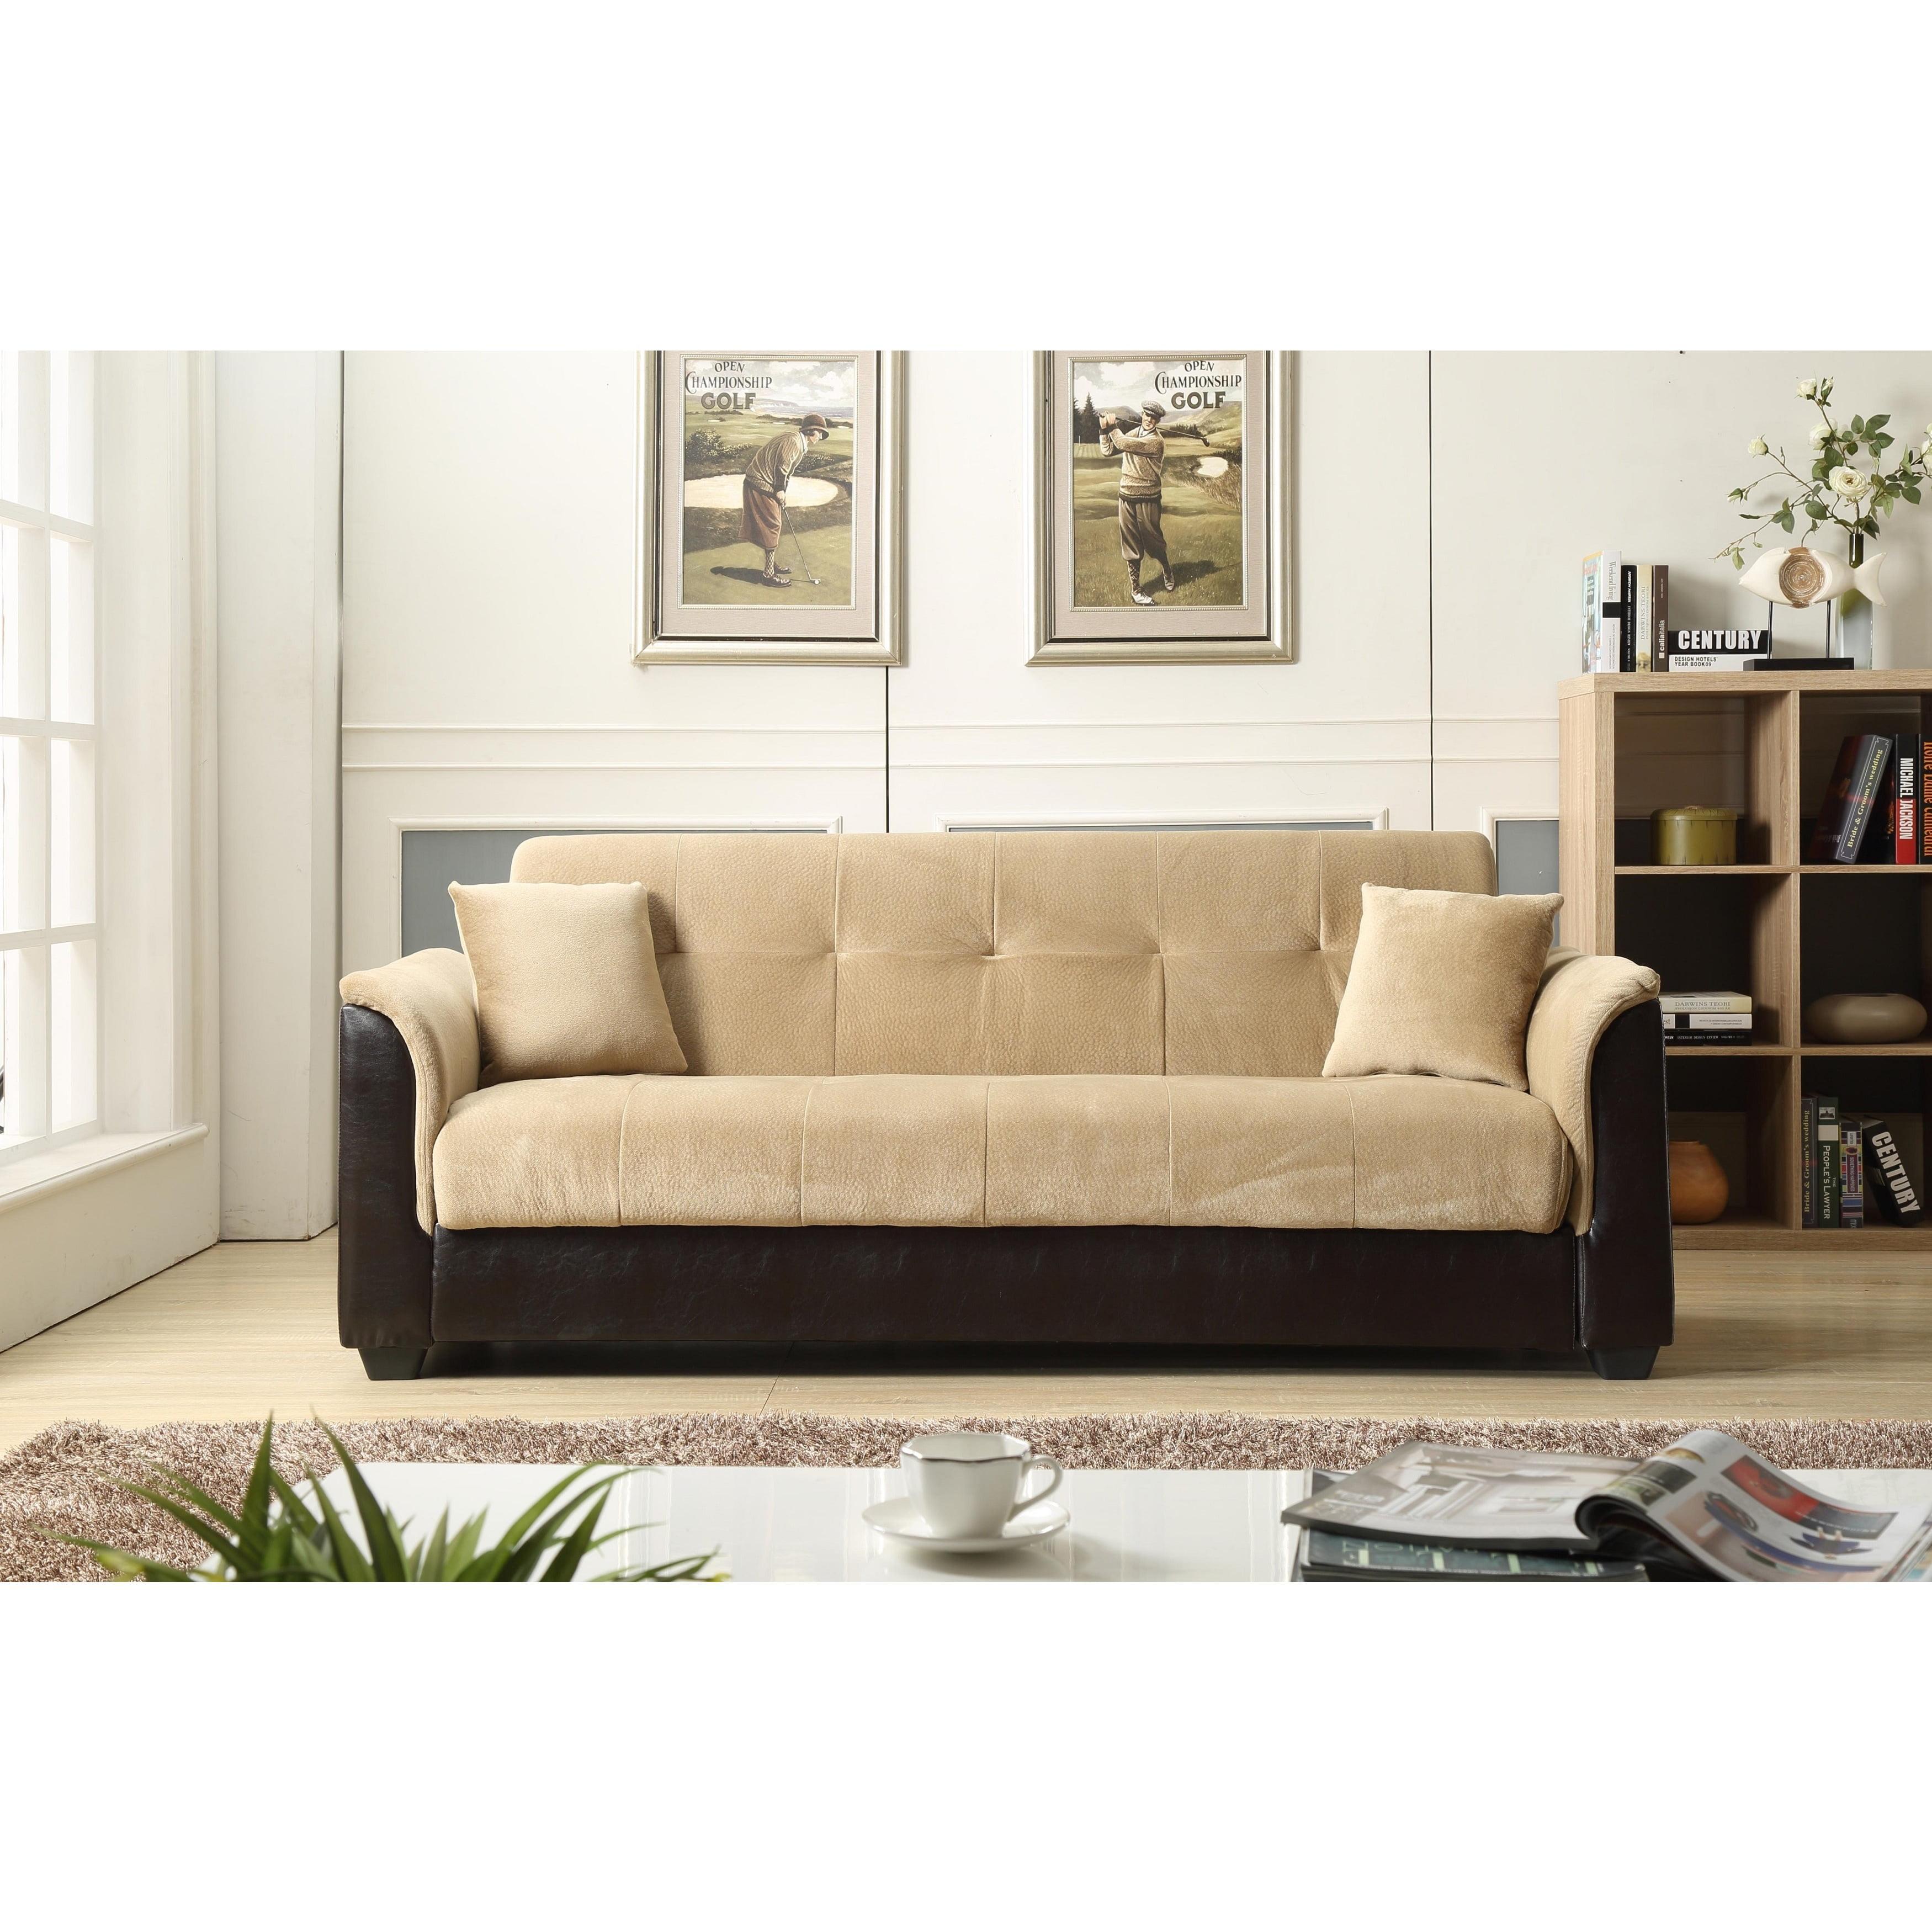 Nhi Express Melanie Futon Sofa Bed With Storage Brown Walmart Com